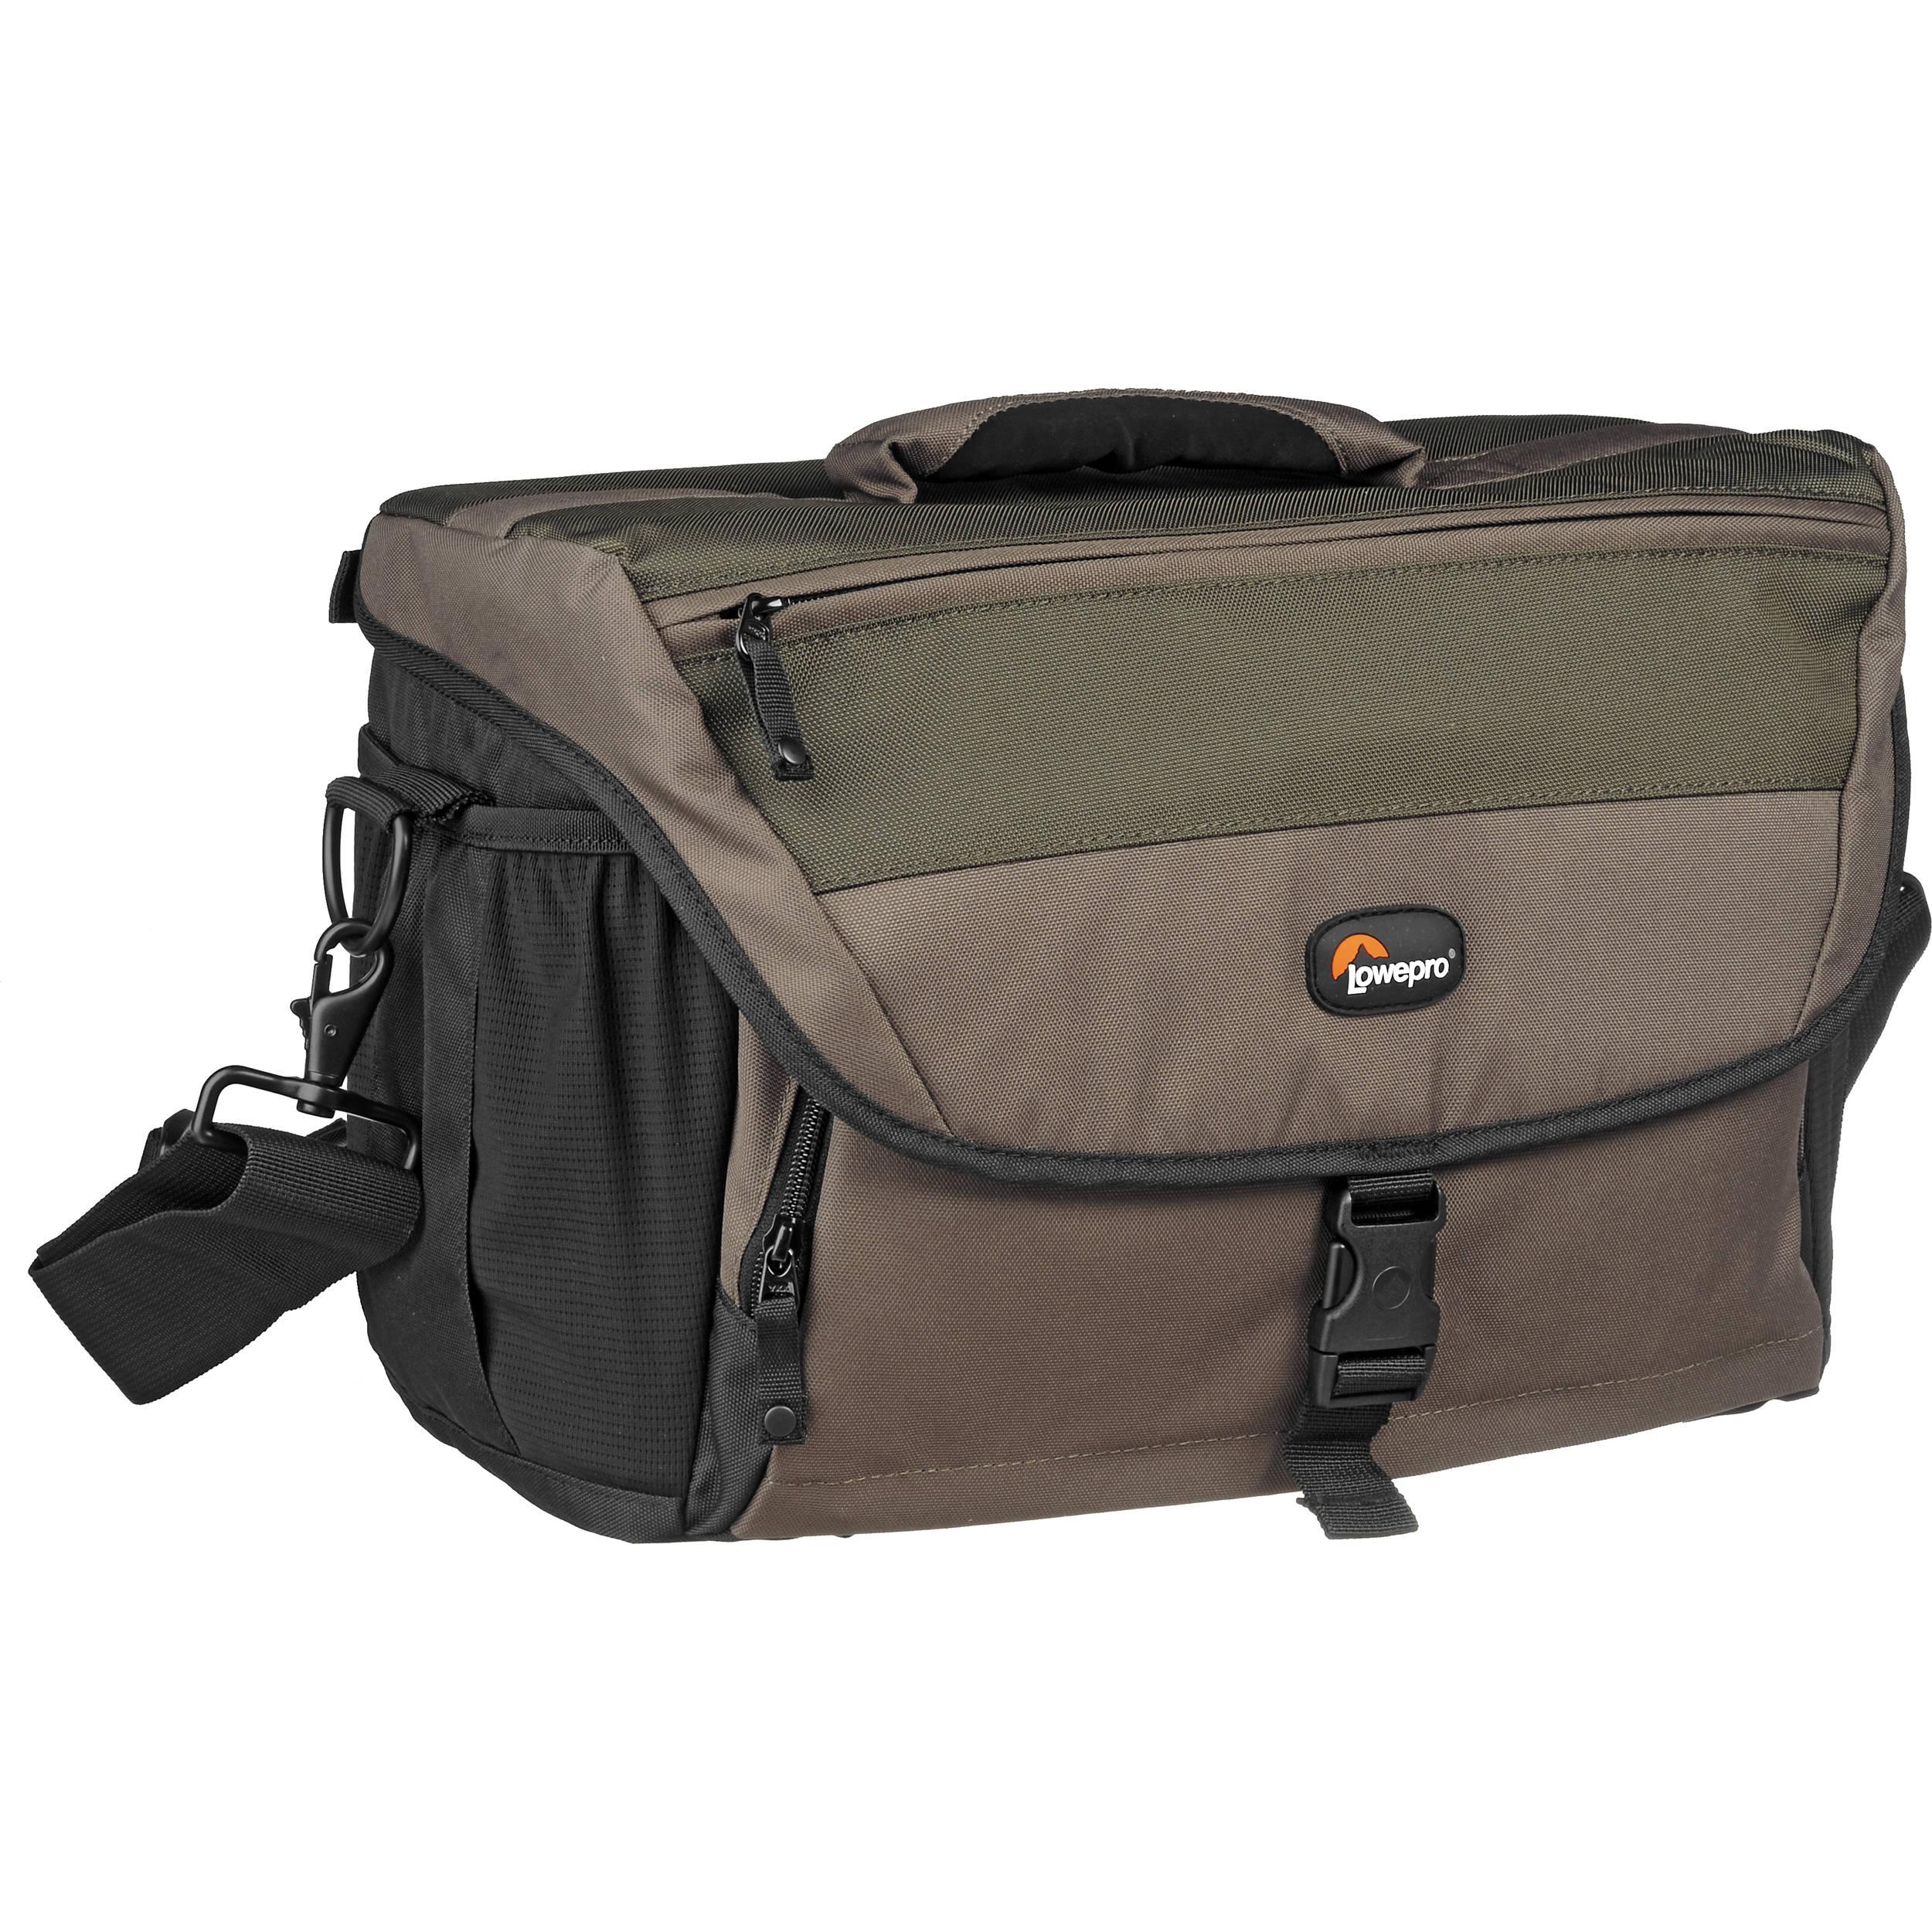 Lowepro Nova 200 Aw Shoulder Bag Lp35266 Peu B Amp H Photo Video